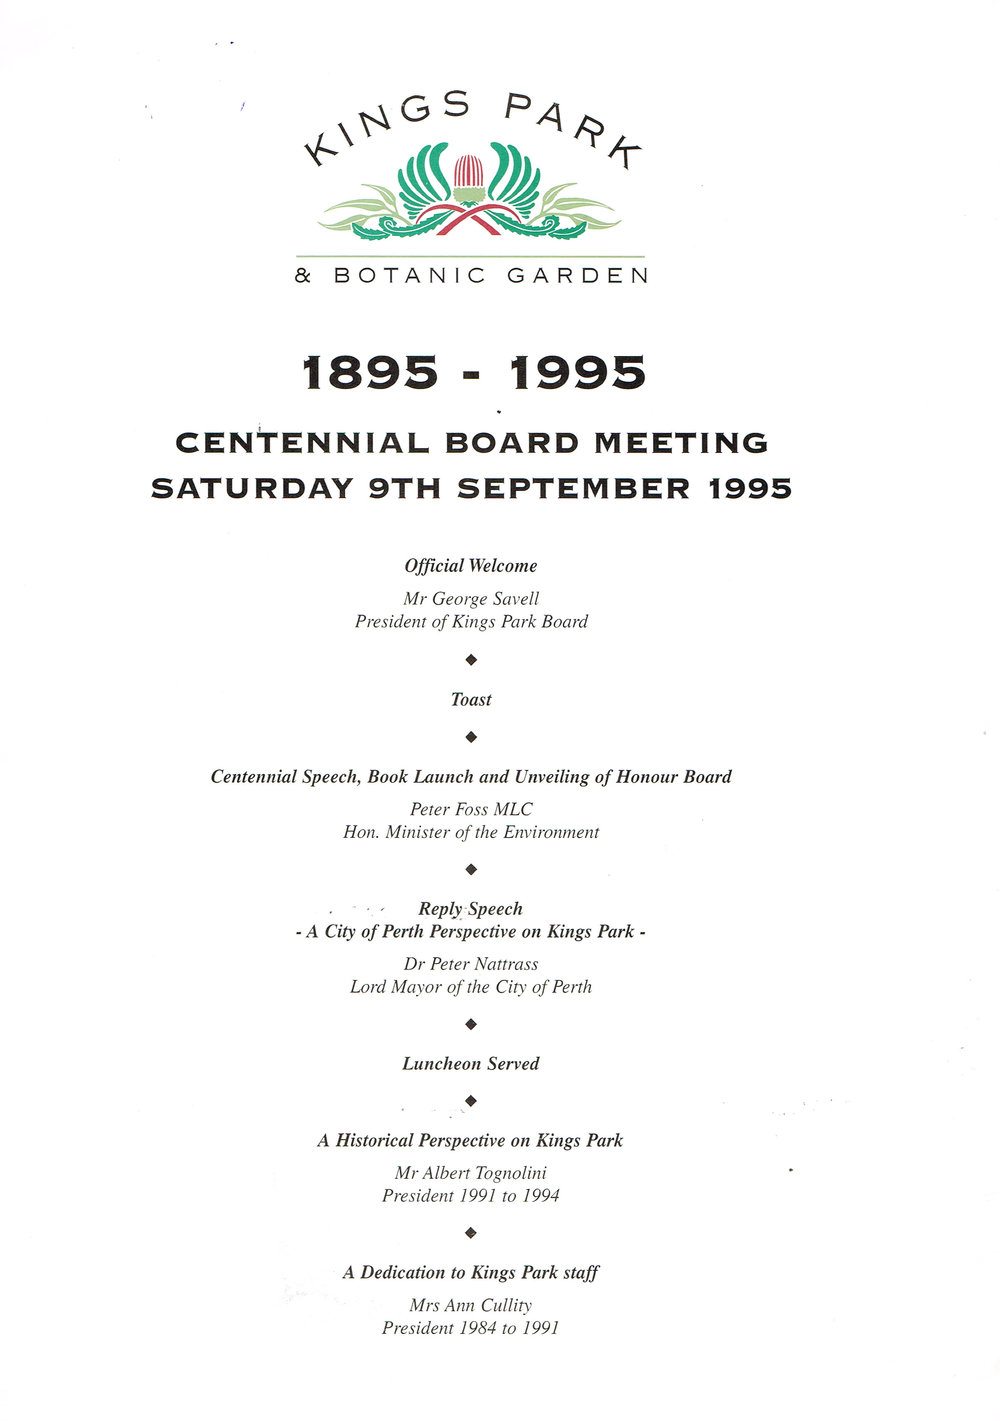 Kings Park & Botanic Garden : 1895 - 1995 Centennial Board Meeting Saturday 9th September 1995